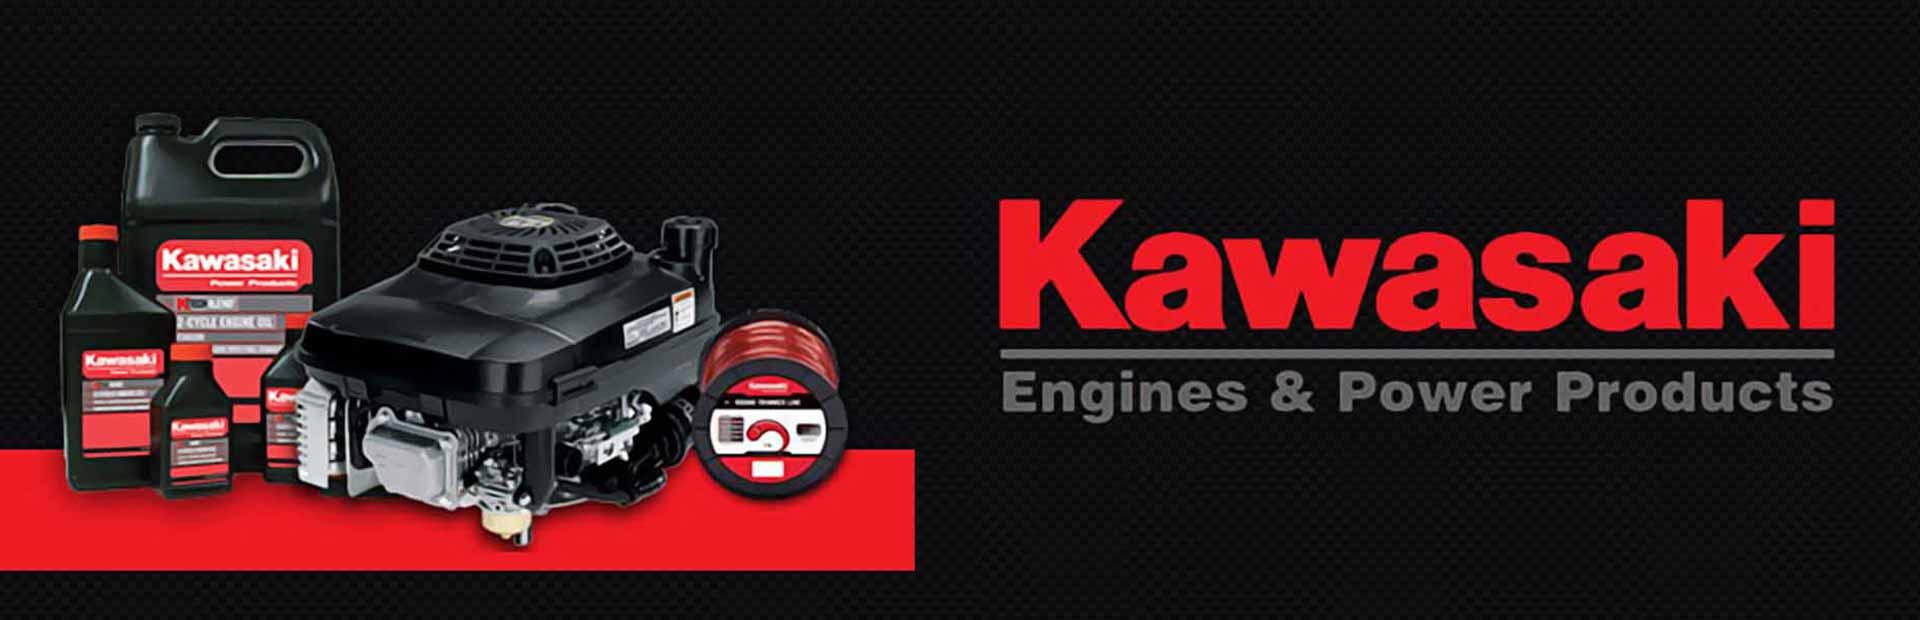 Home Wagoner Power Equipment Englewood, OH (937) 836-9611